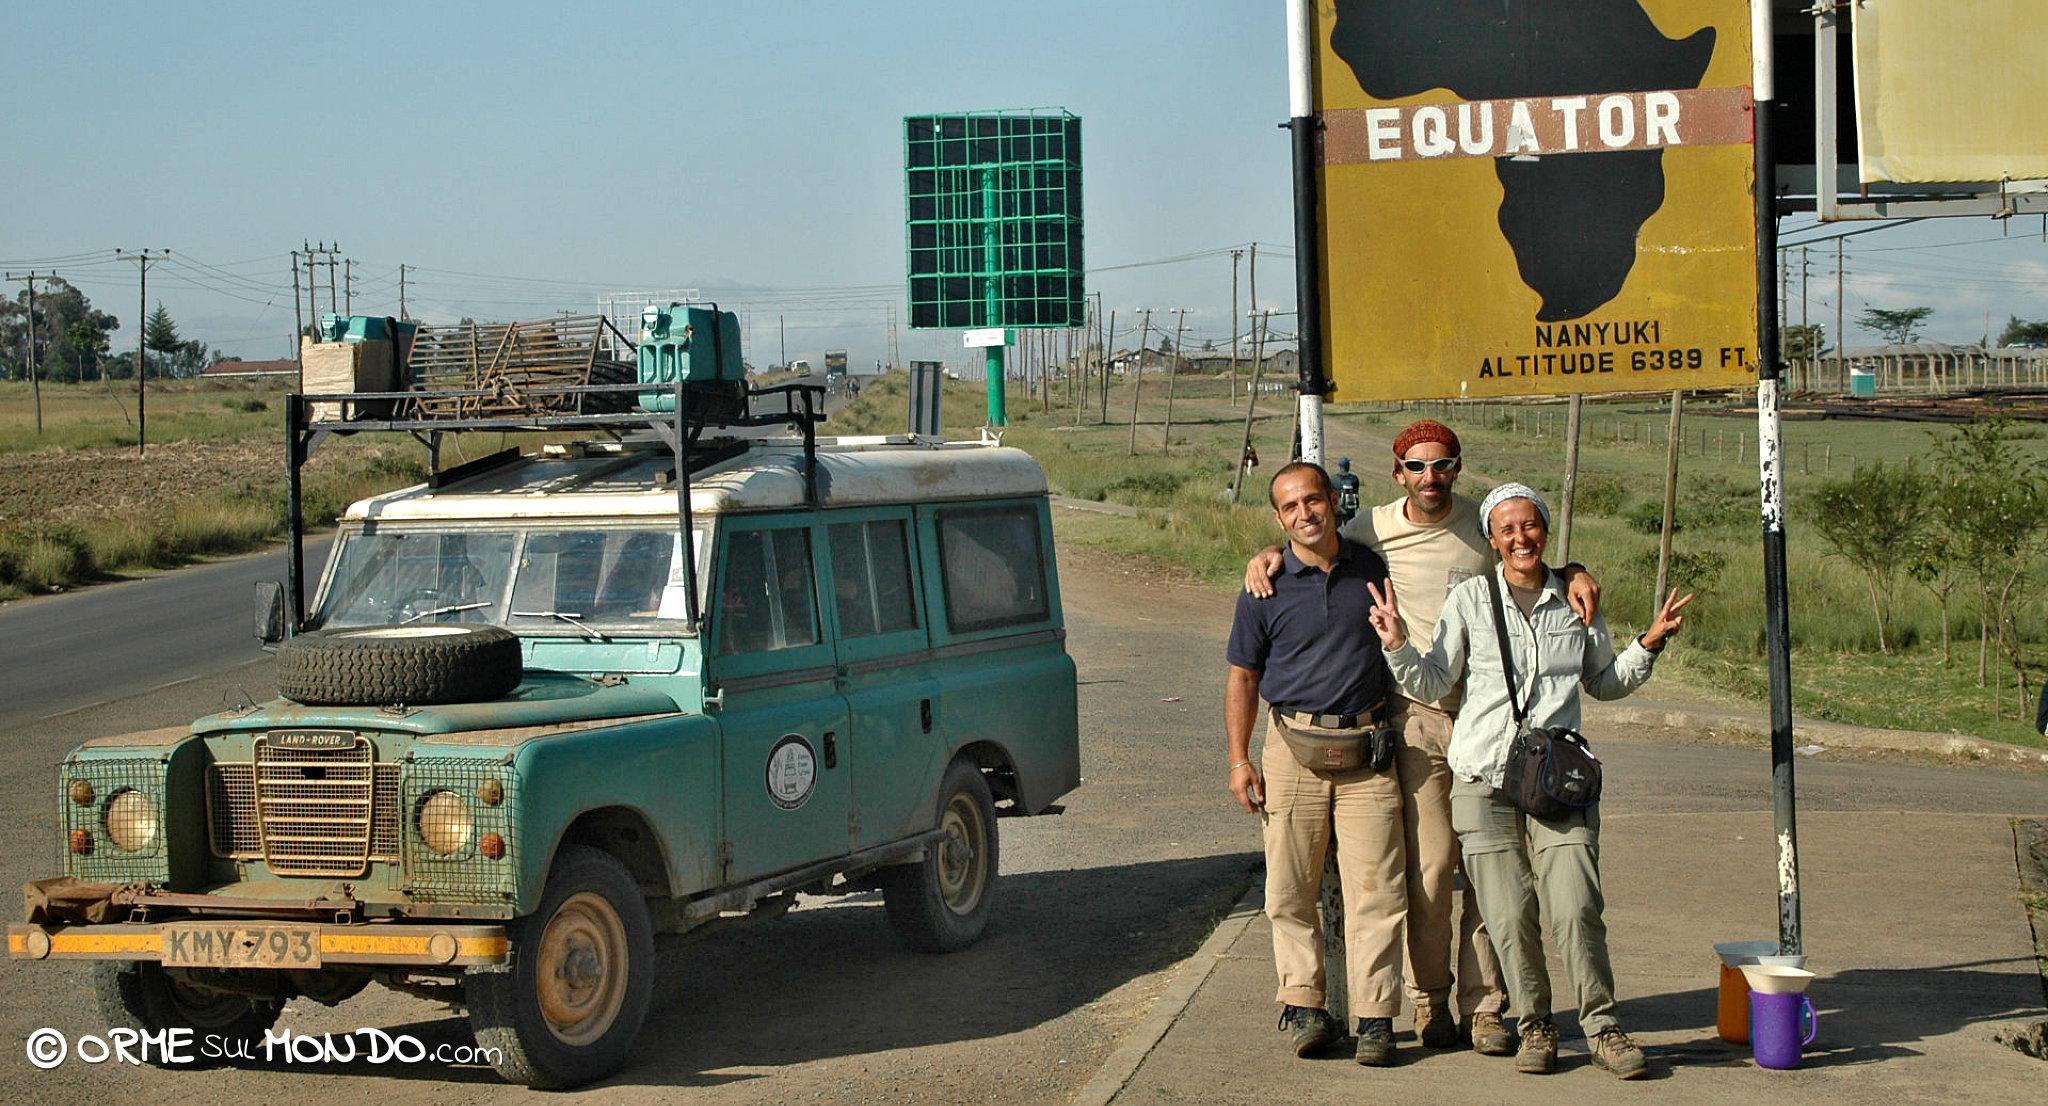 landrover equatore amici africa kenya